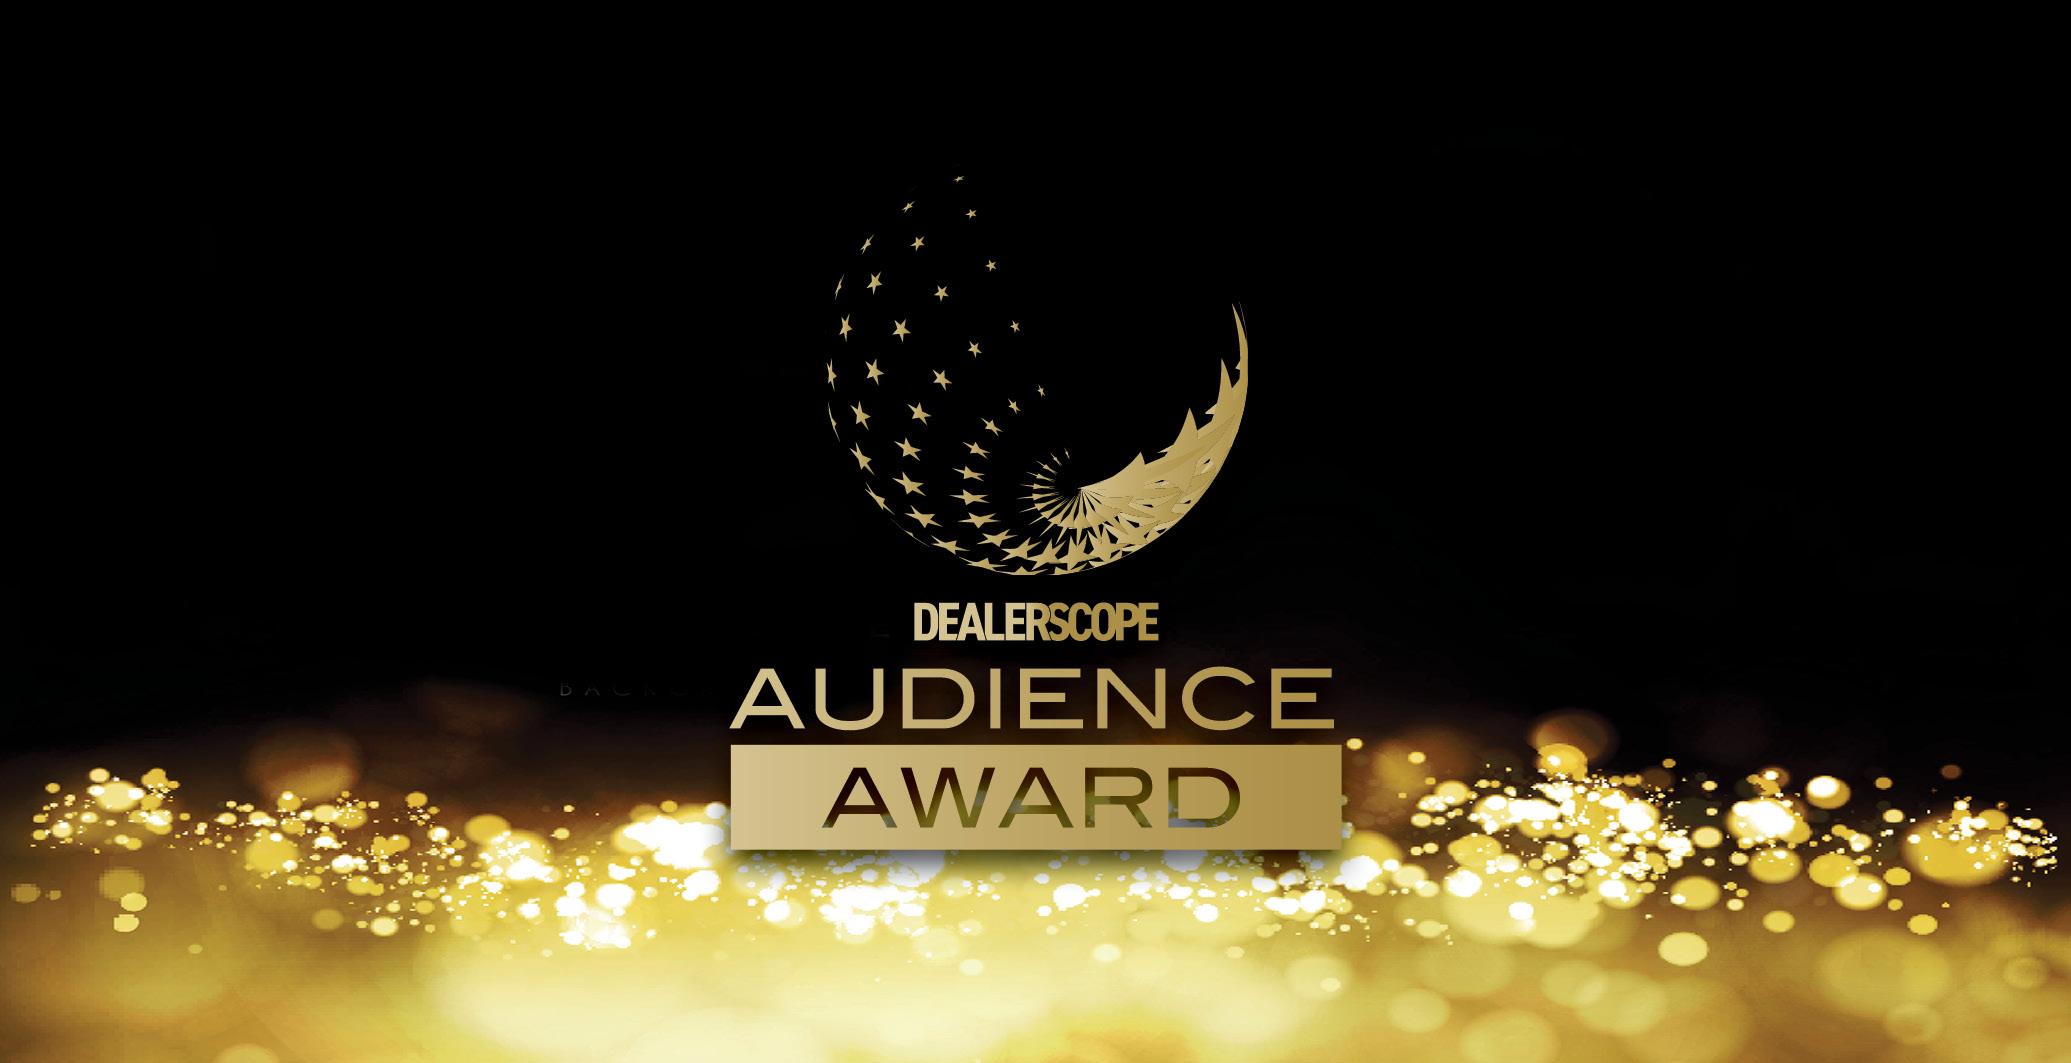 Dealerscope Audience Awards 2021